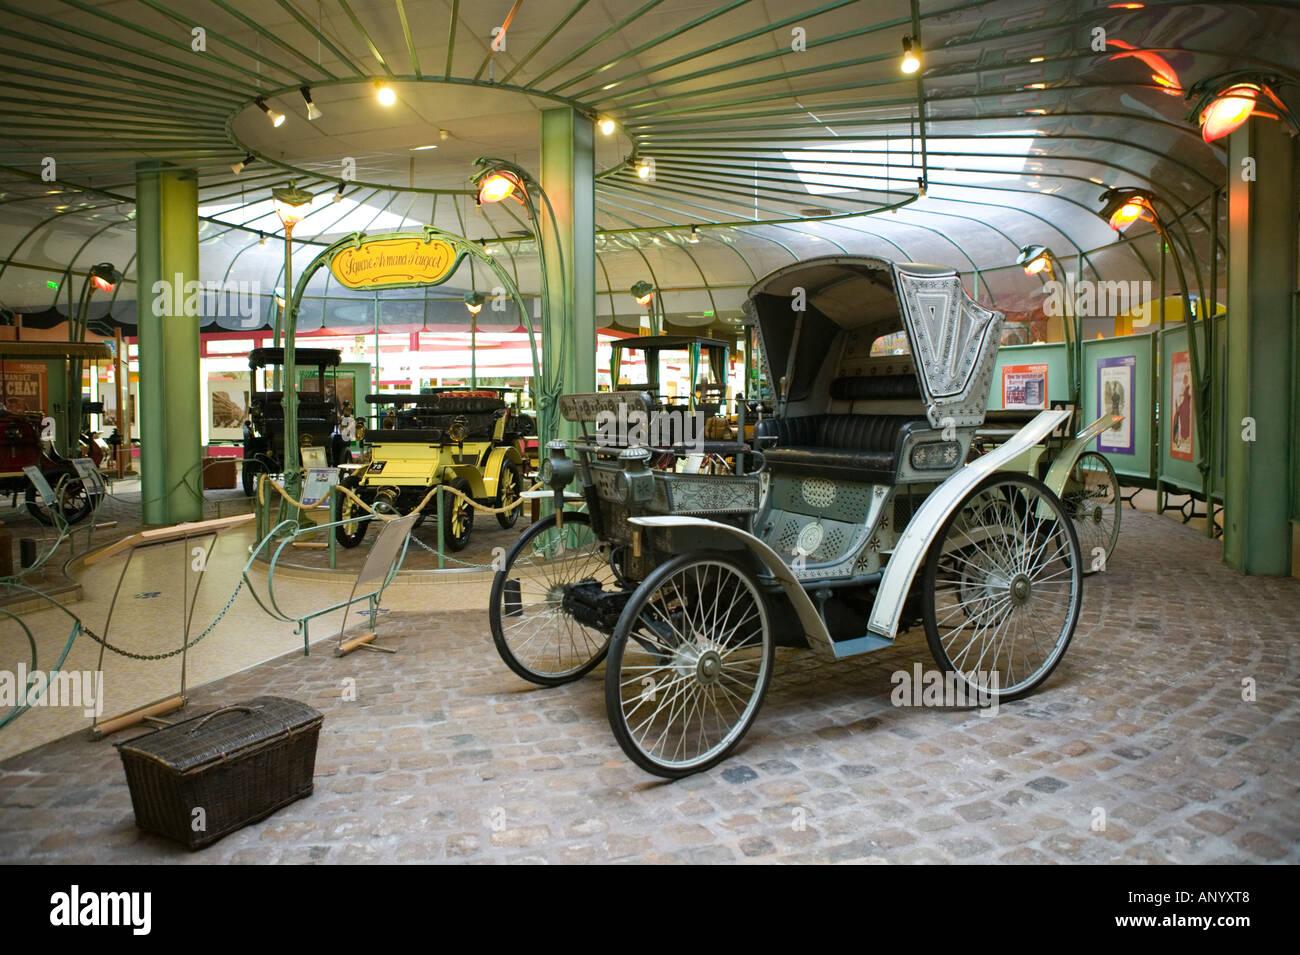 france jura doubs montbeliard sochaux peugeot car museum by main stock photo 8931079 alamy. Black Bedroom Furniture Sets. Home Design Ideas